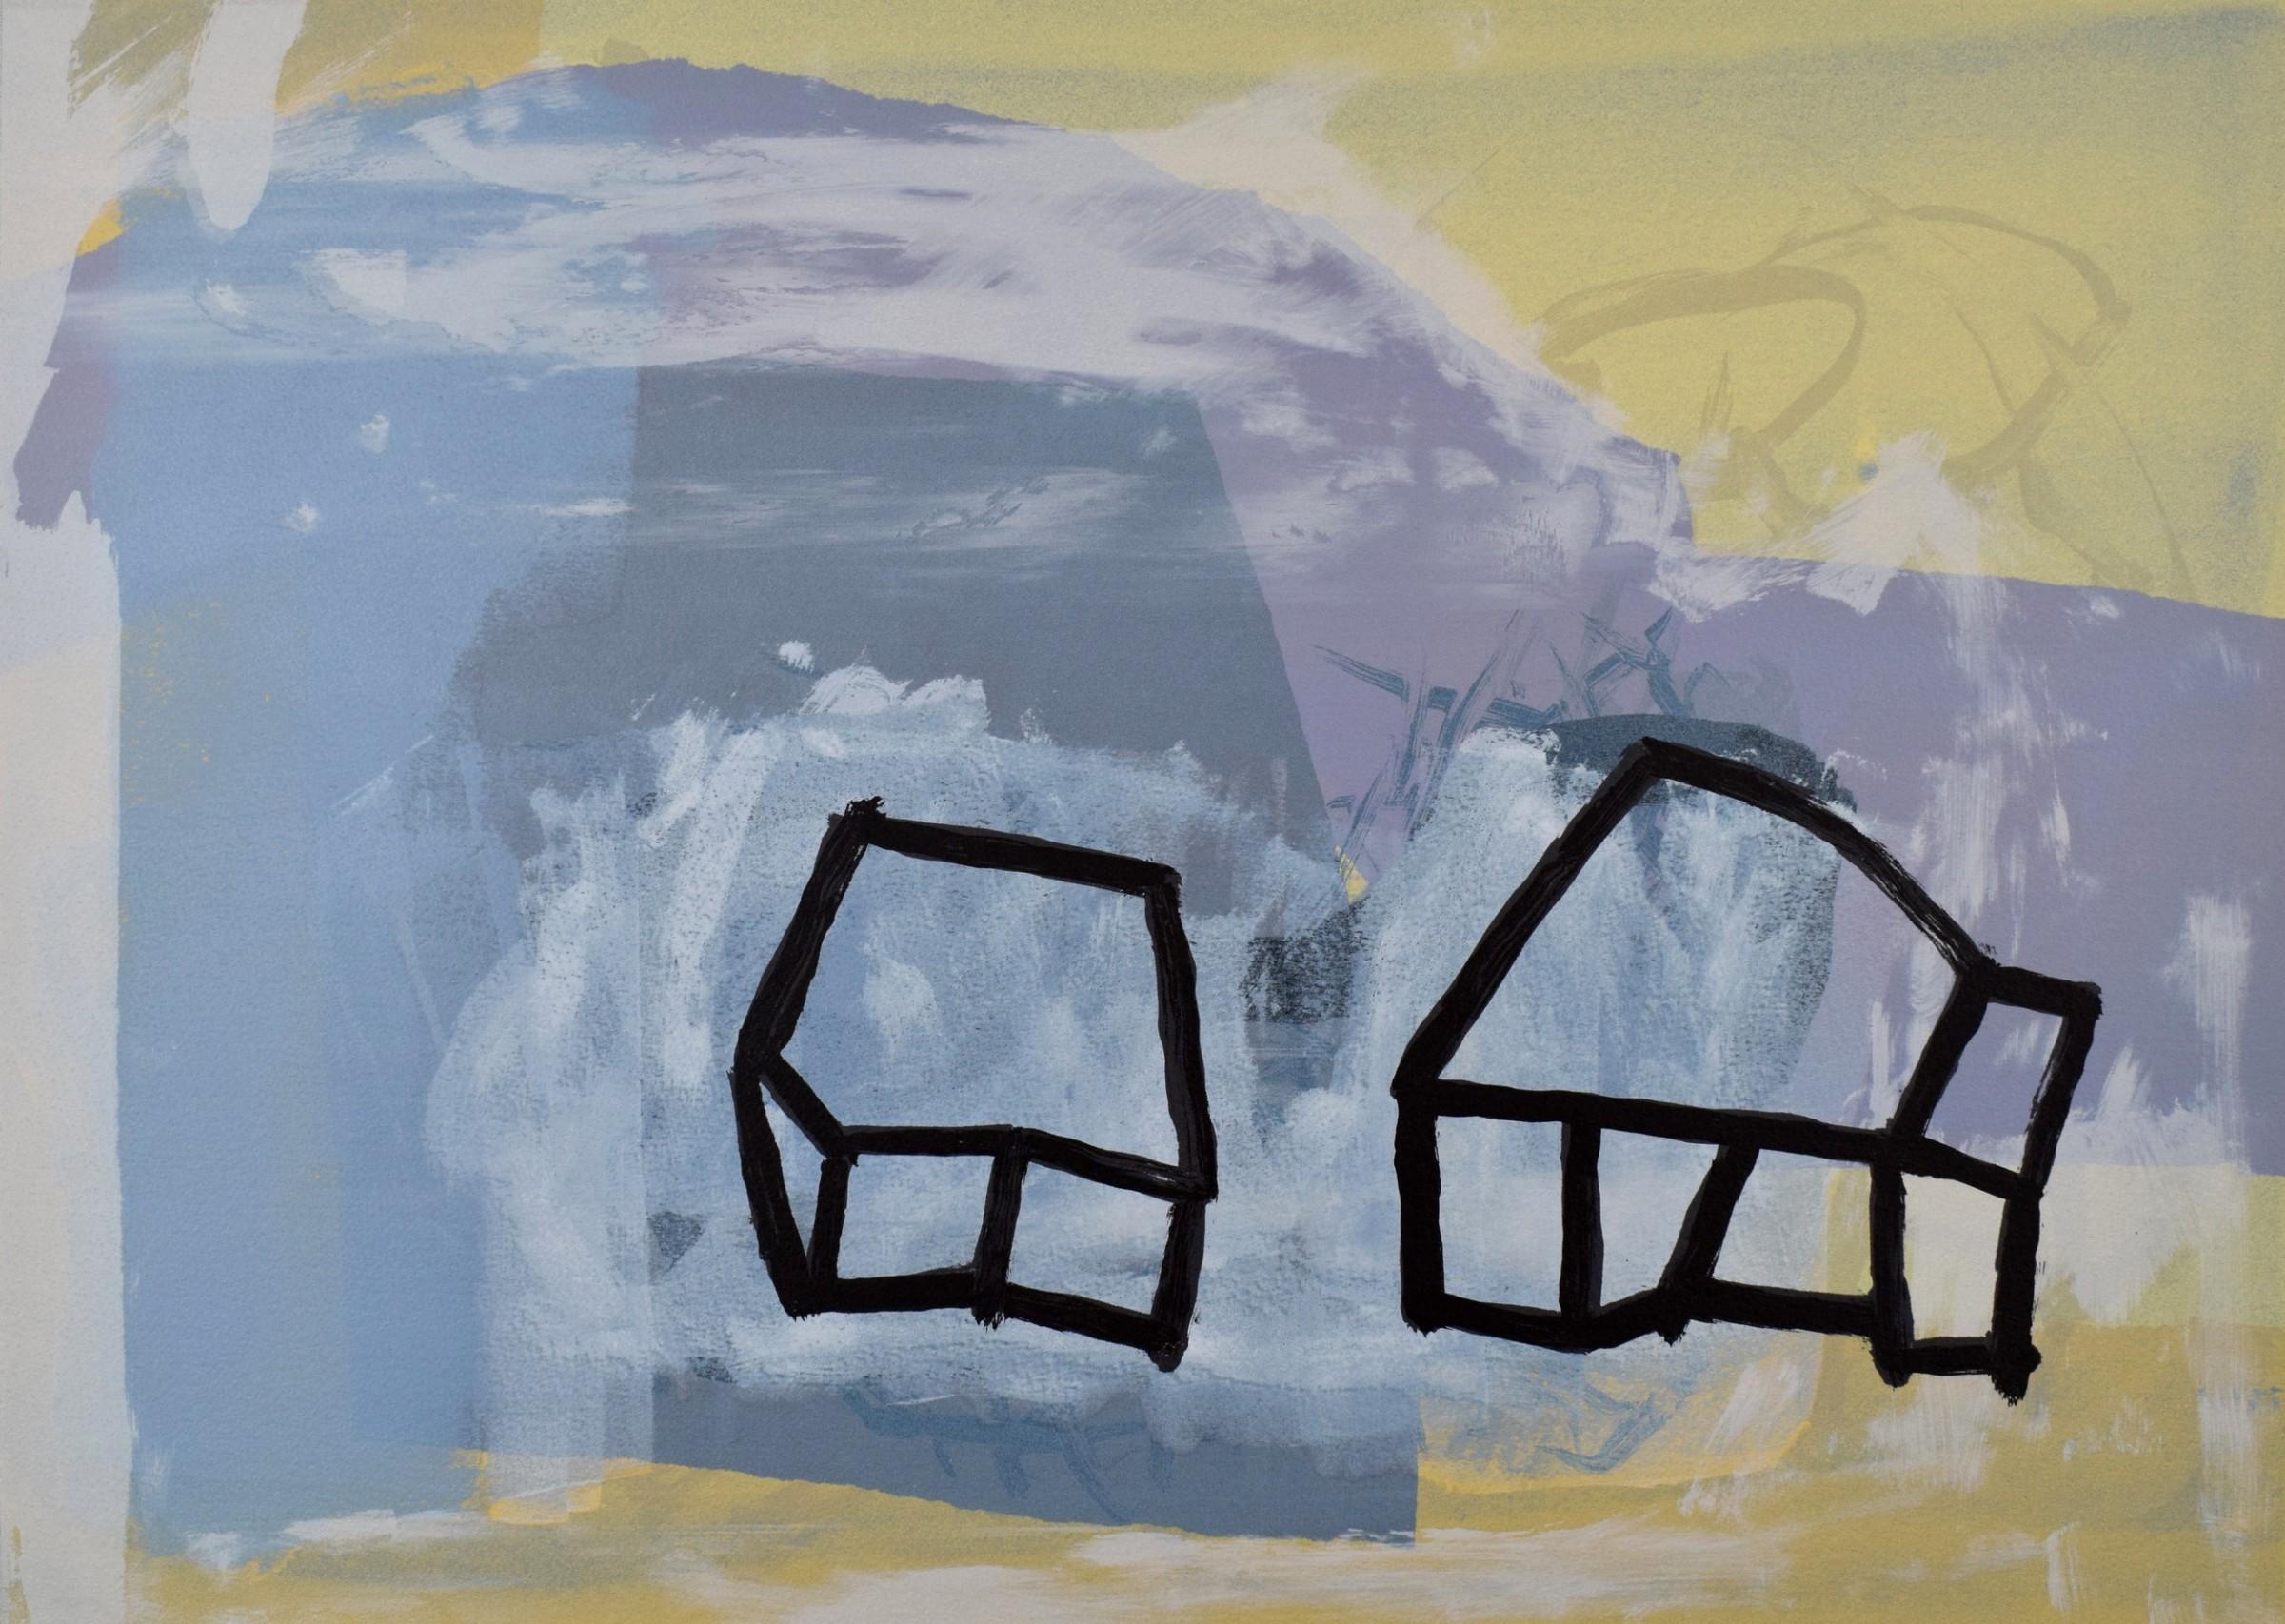 "<span class=""link fancybox-details-link""><a href=""/artists/75-michelle-griffiths-vpre/works/10949/"">View Detail Page</a></span><div class=""artist""><span class=""artist""><strong>Michelle Griffiths VPRE</strong></span></div><div class=""title""><em>Synchronicity I</em></div><div class=""medium"">screen monoprint</div><div class=""dimensions"">72 x 86cm framed<br /> 44 x 59cm image size</div><div class=""edition_details"">1/1</div><div class=""price"">£630.00 framed<br>£550.00 unframed</div>"